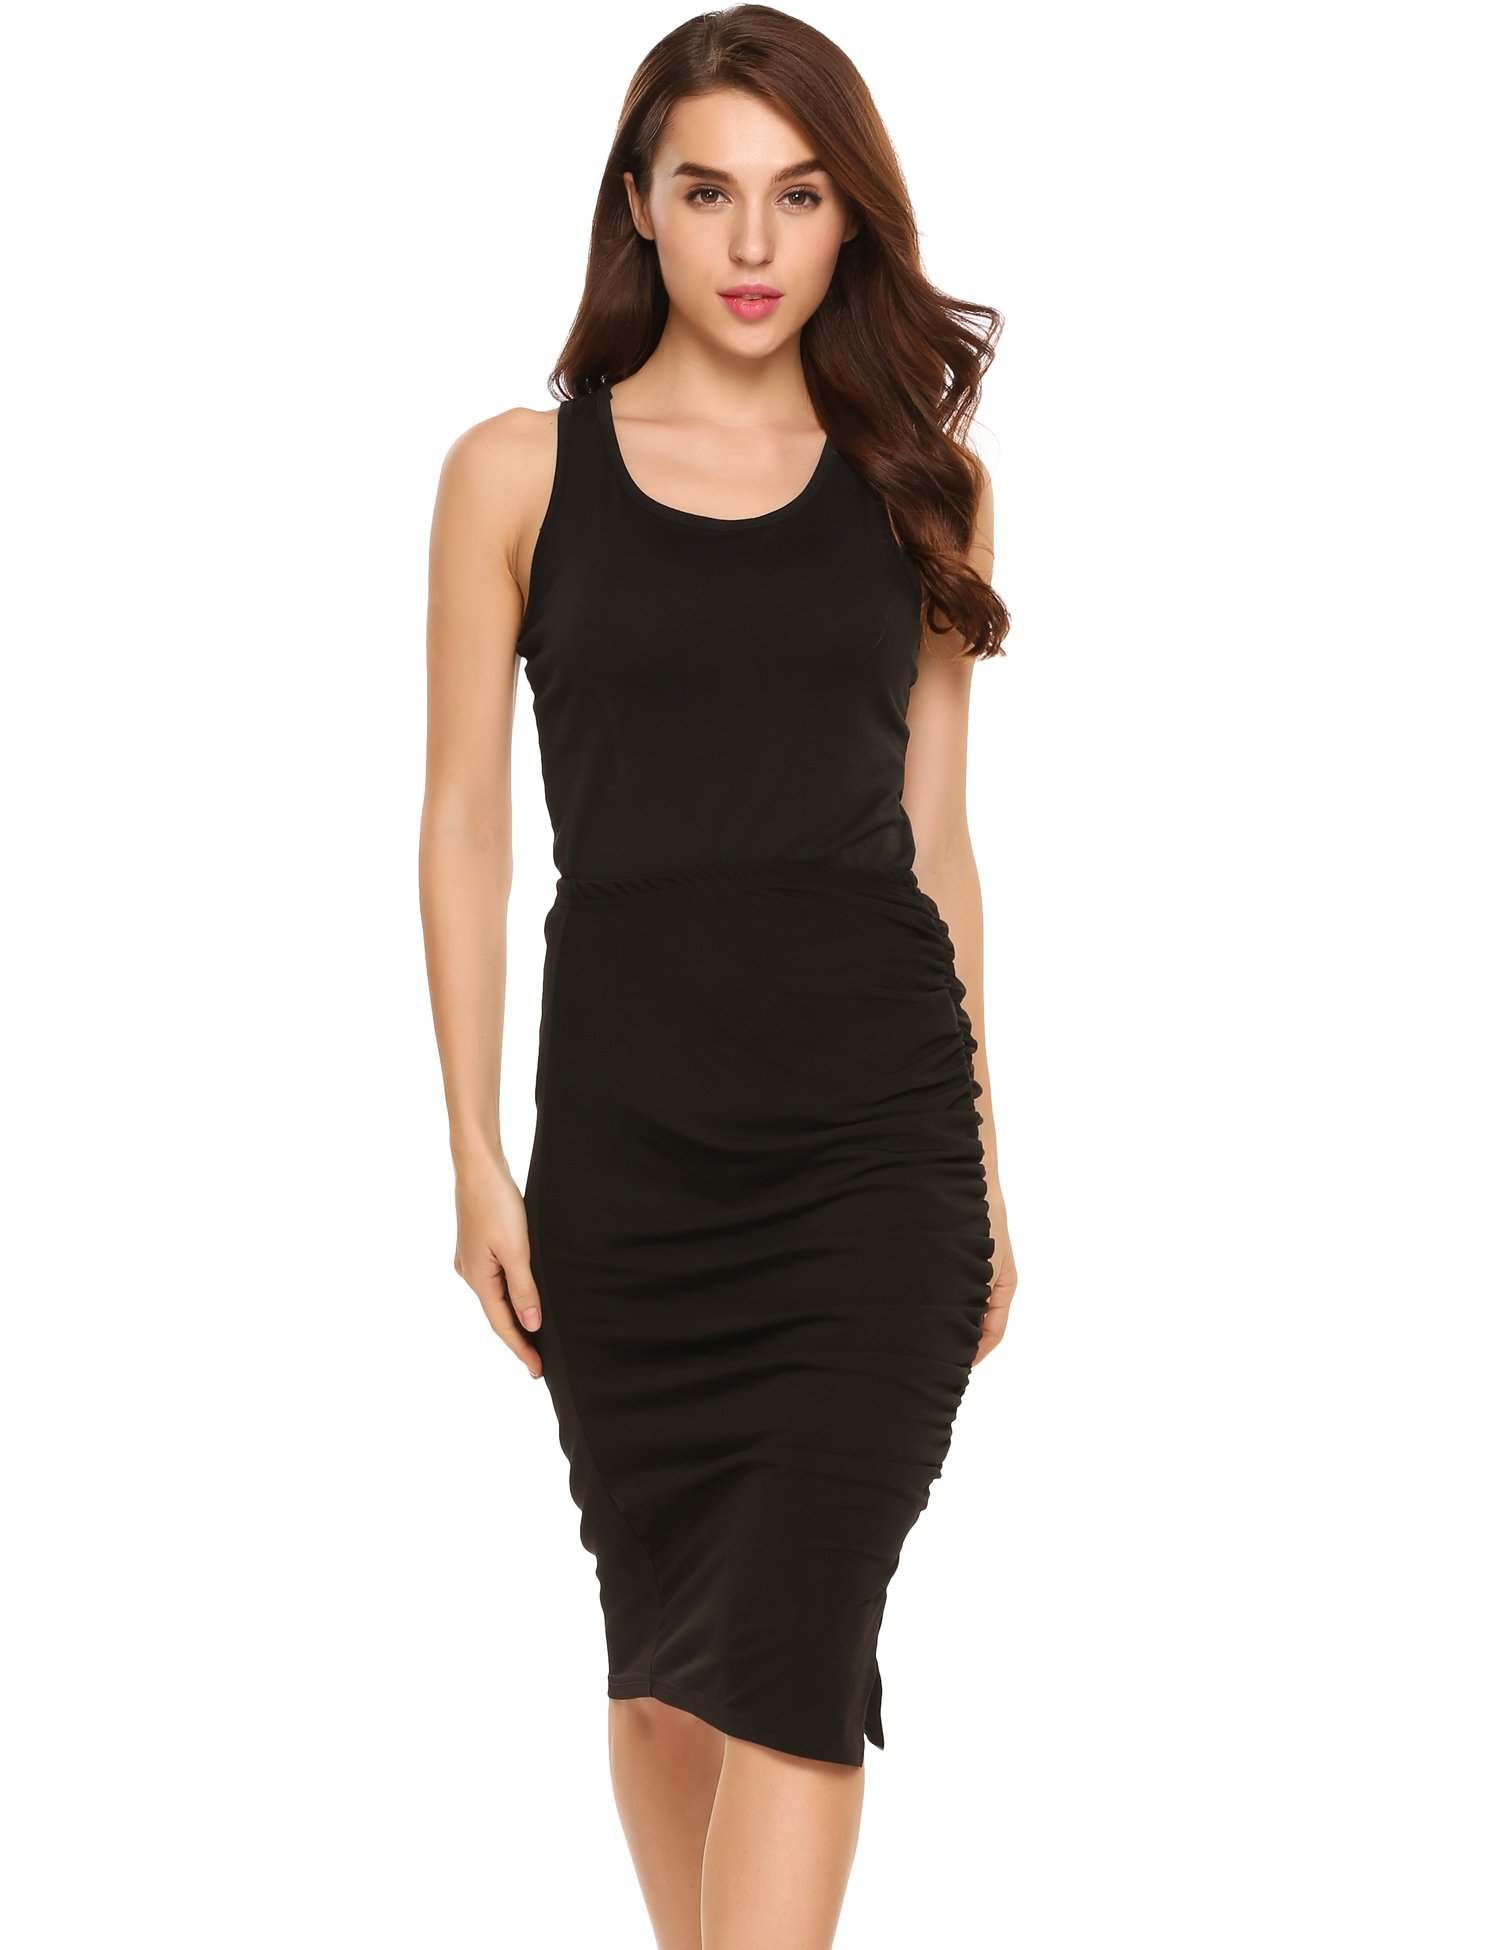 Zeagoo Womens Elegant Ruched Frill Ruffle High Waist Pencil Mid-Calf Skirt